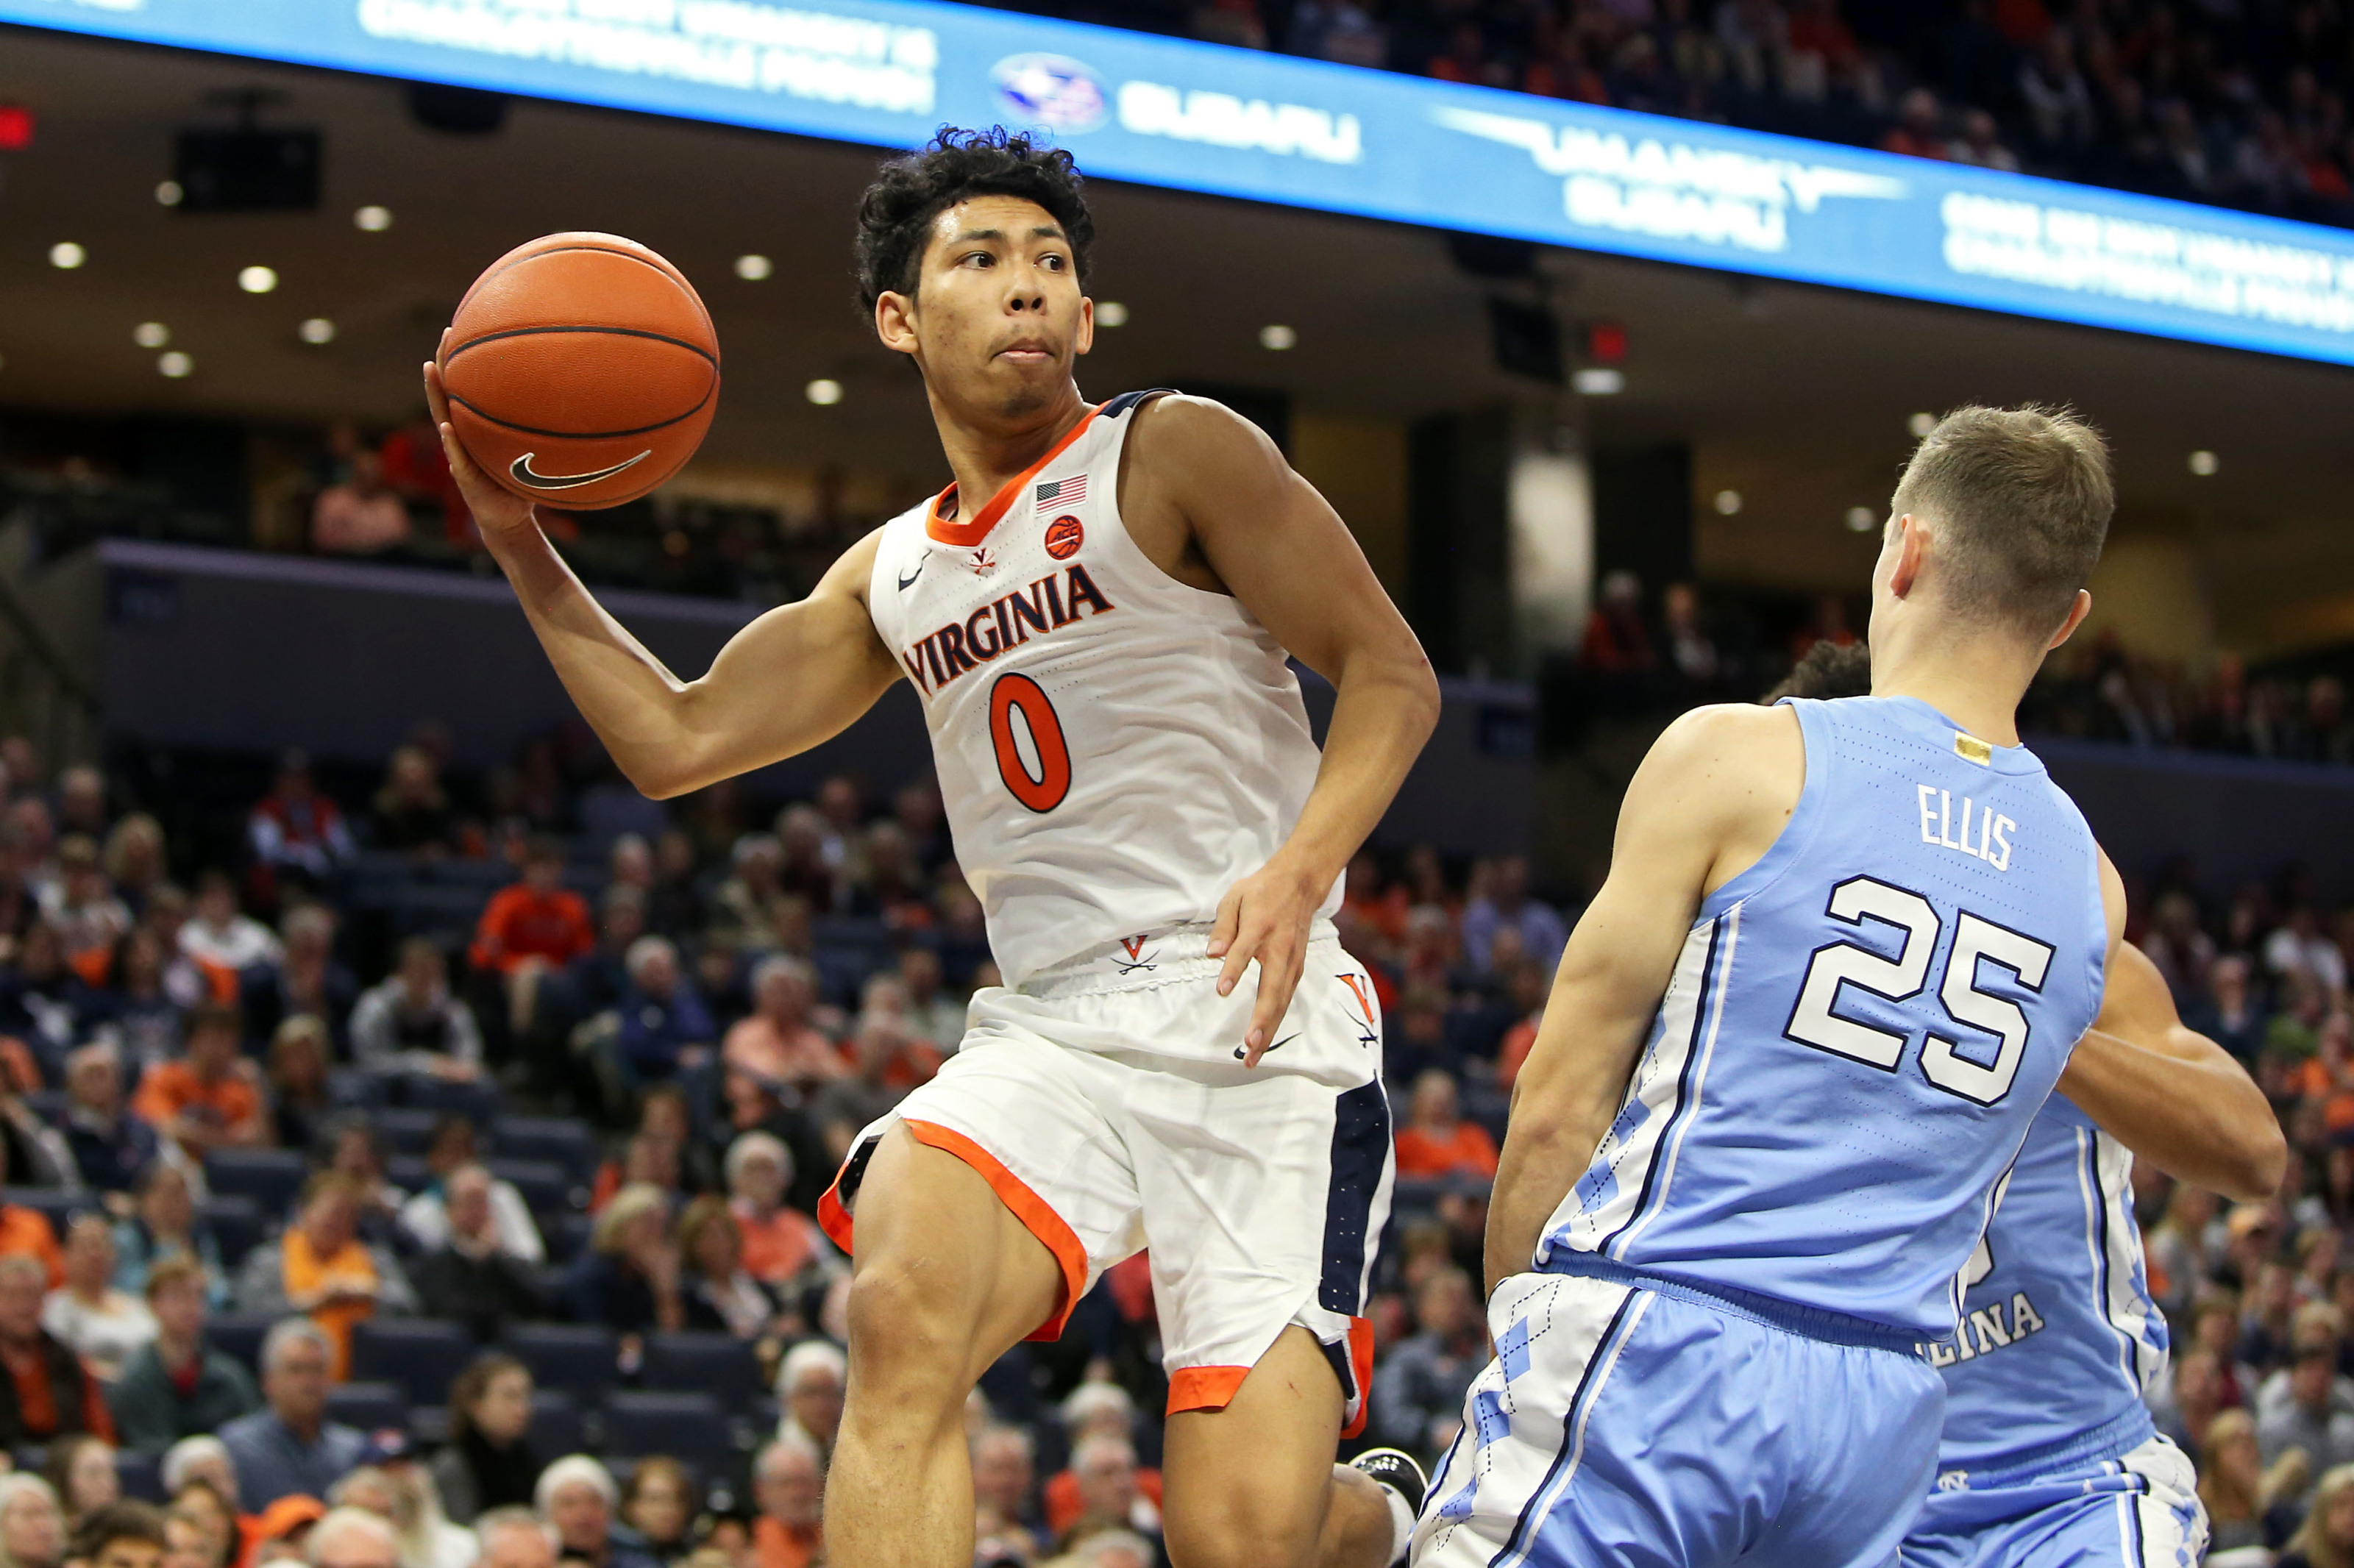 Caleb Ellis North Carolina Tar Heels Final Four Basketball Jersey